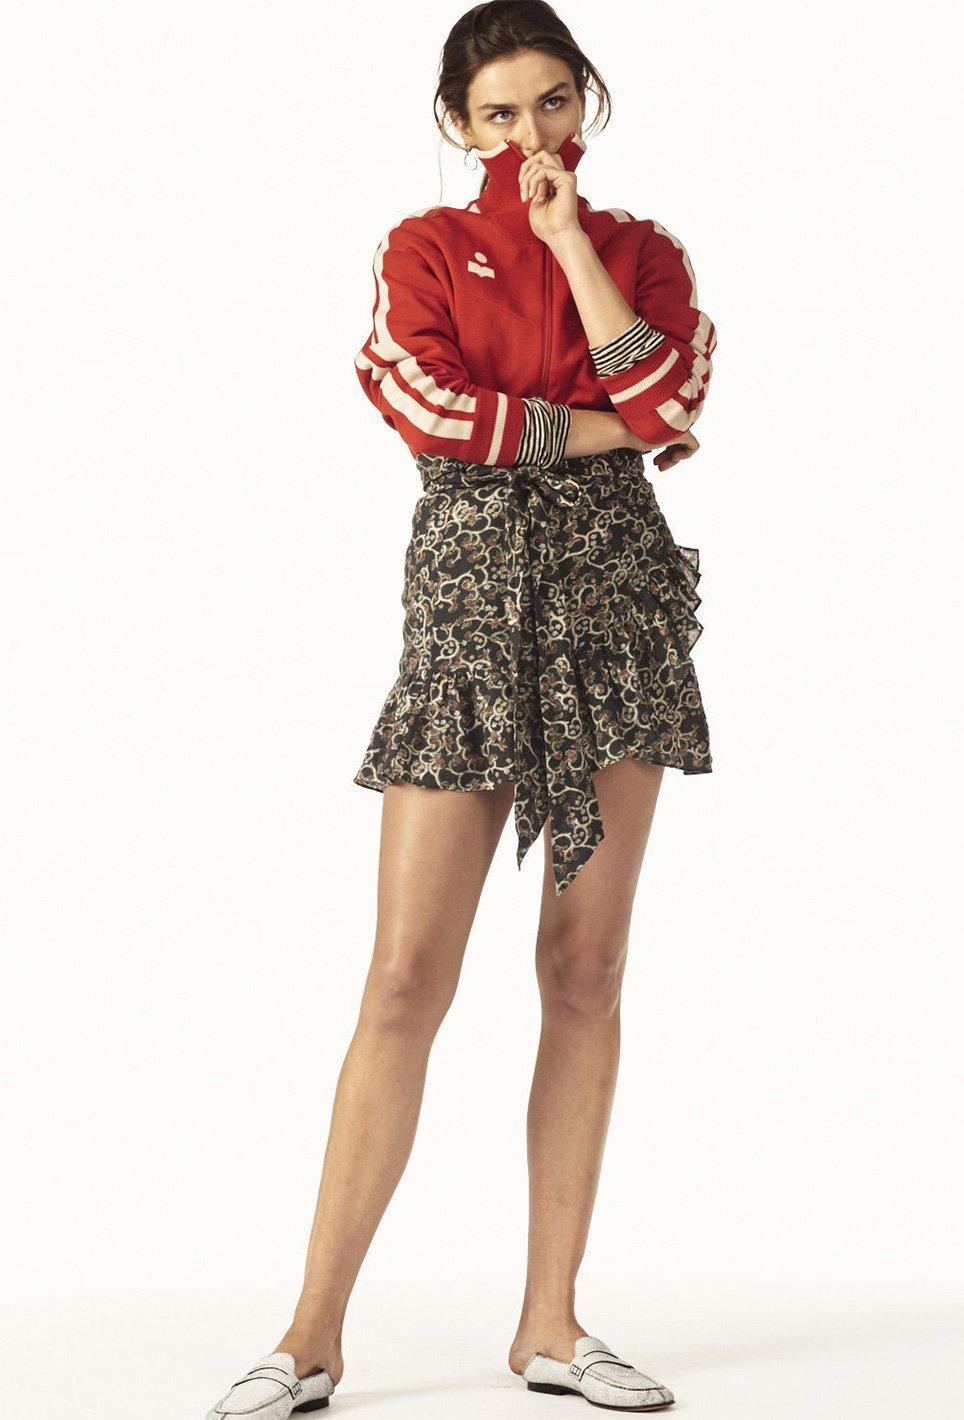 Fashion Trend Report Zip